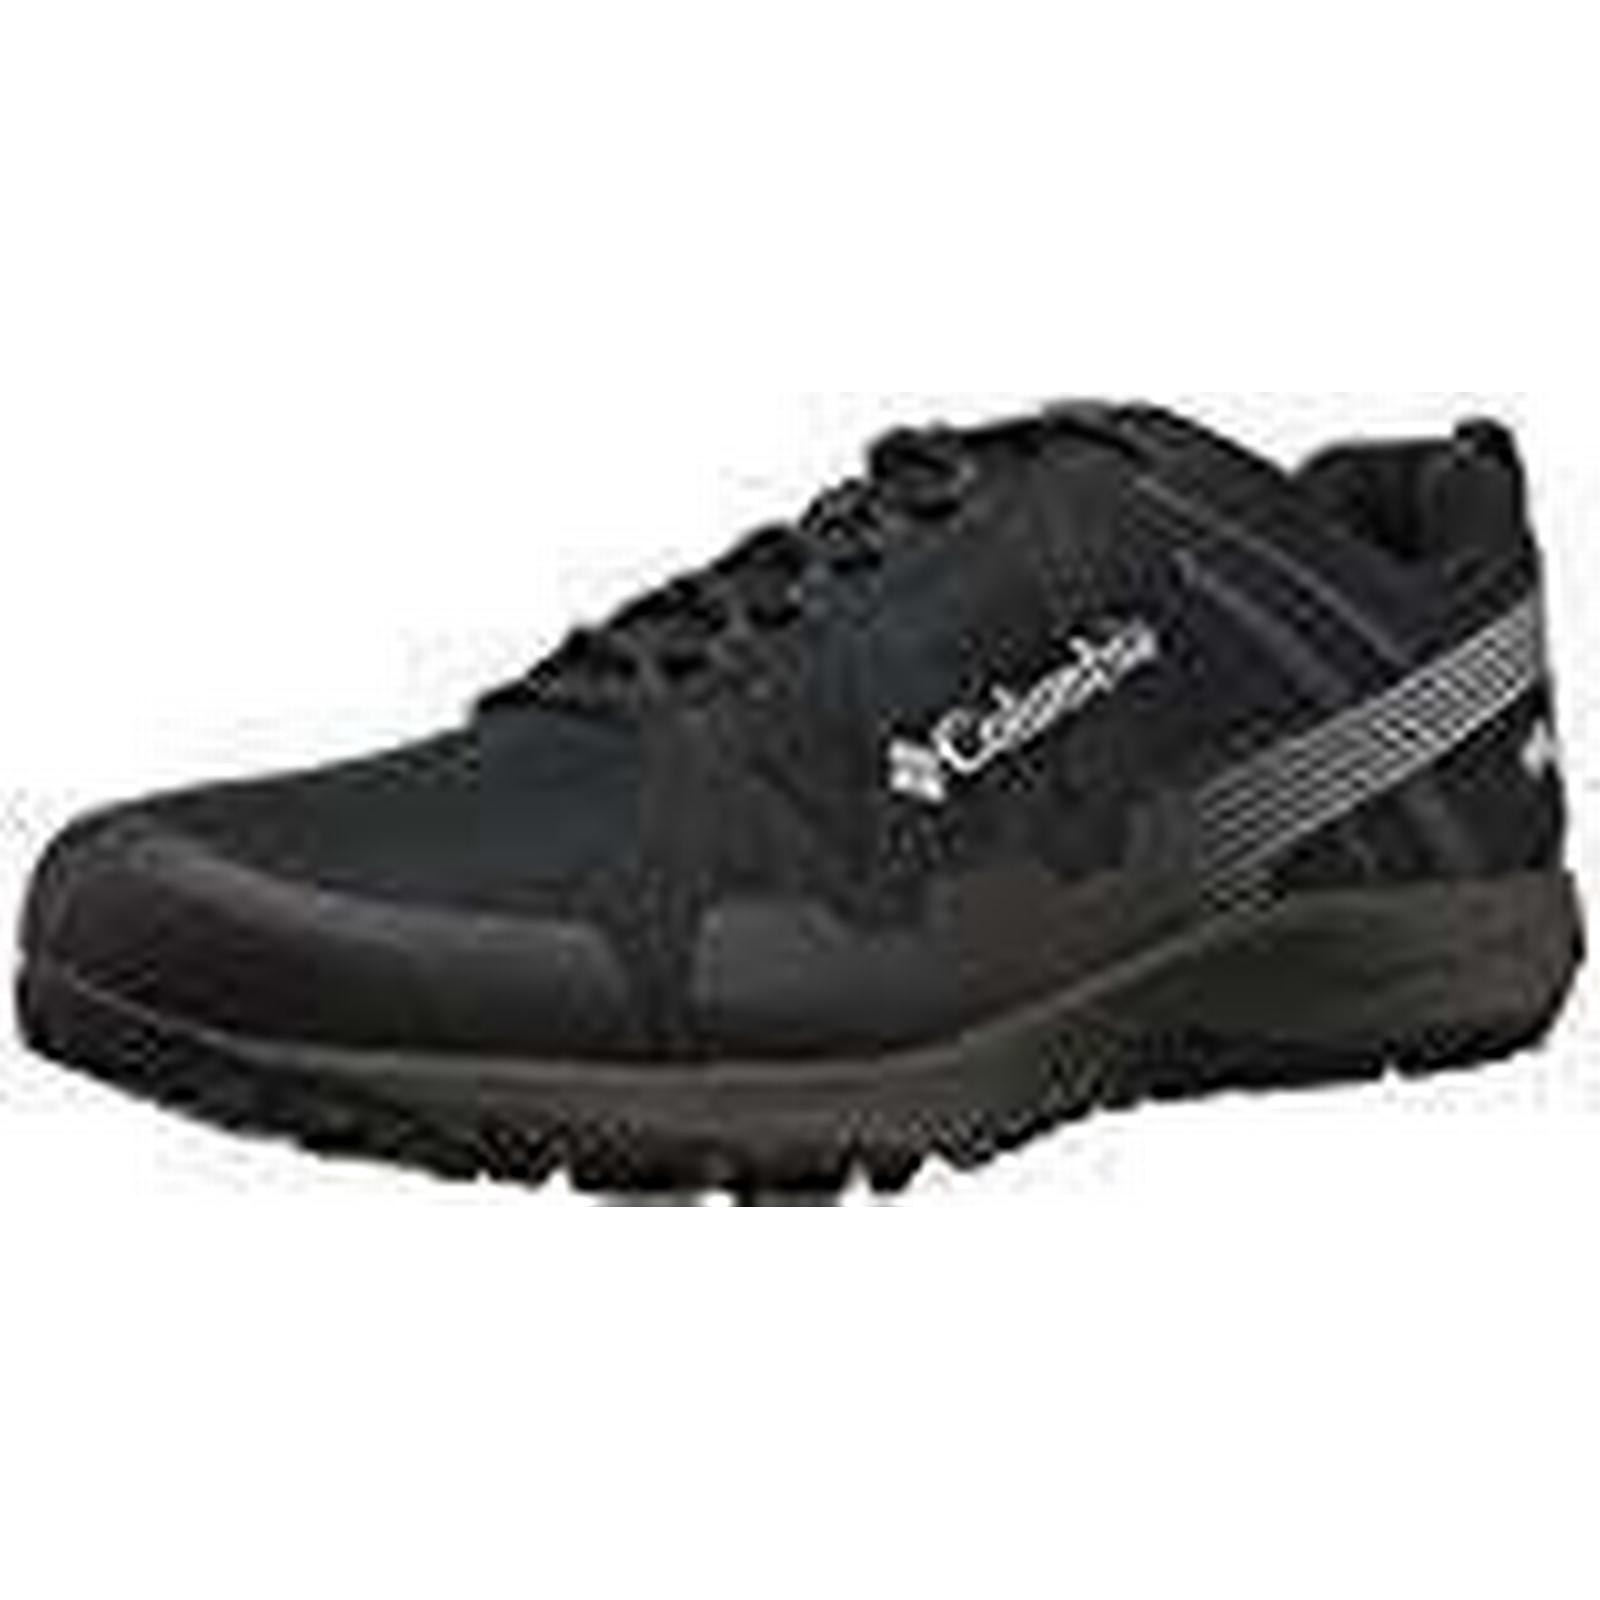 Columbia Men's Conspiracy V Outdry Low (Black/Lux), Rise Hiking Shoes, Black (Black/Lux), Low 12 UK (46 EU) 99d331